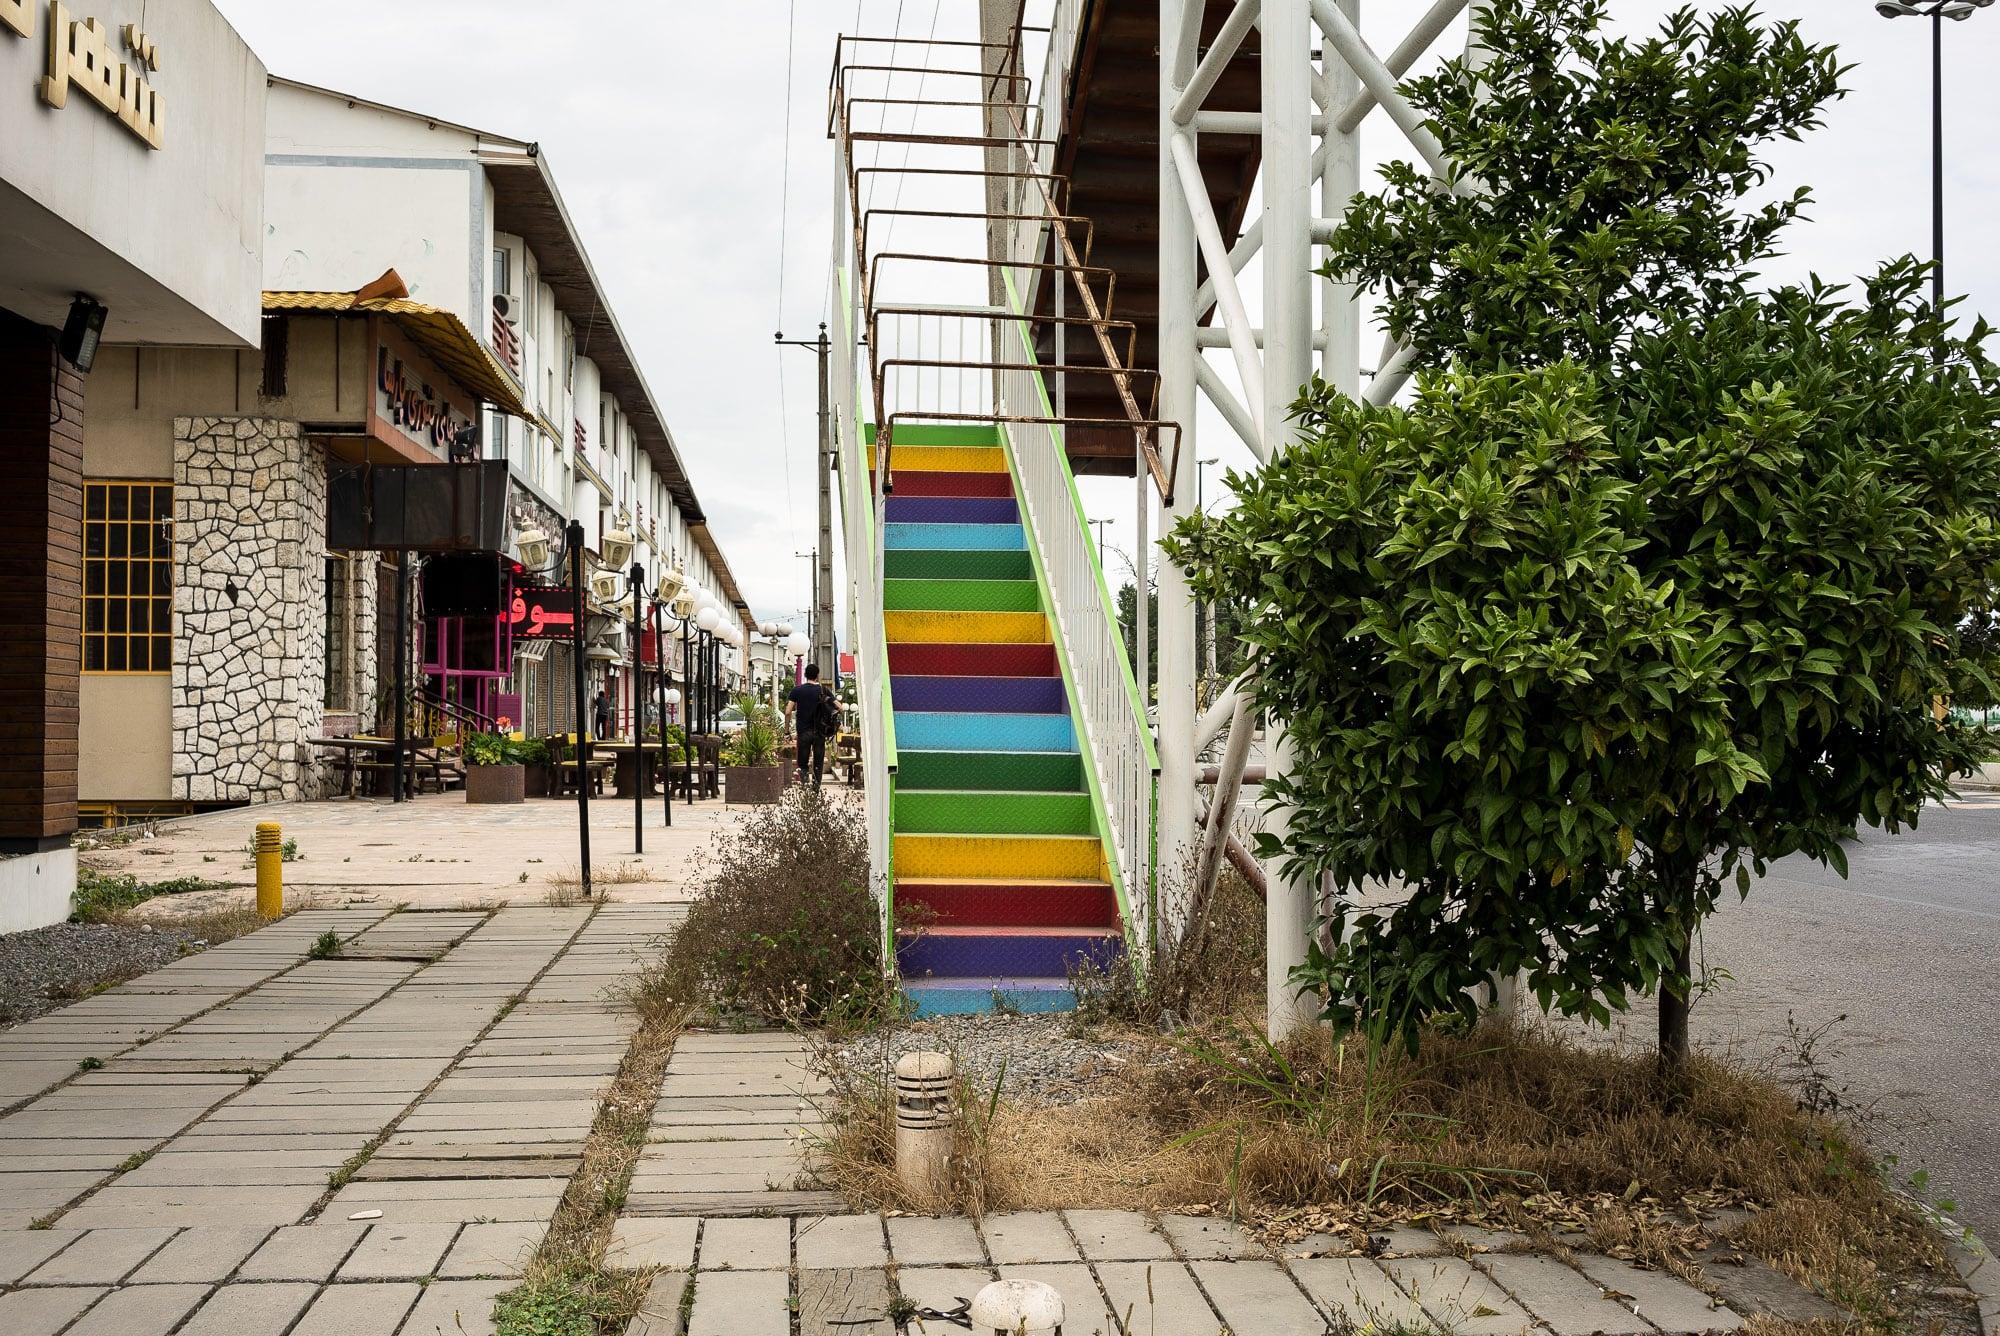 fabulous stairway